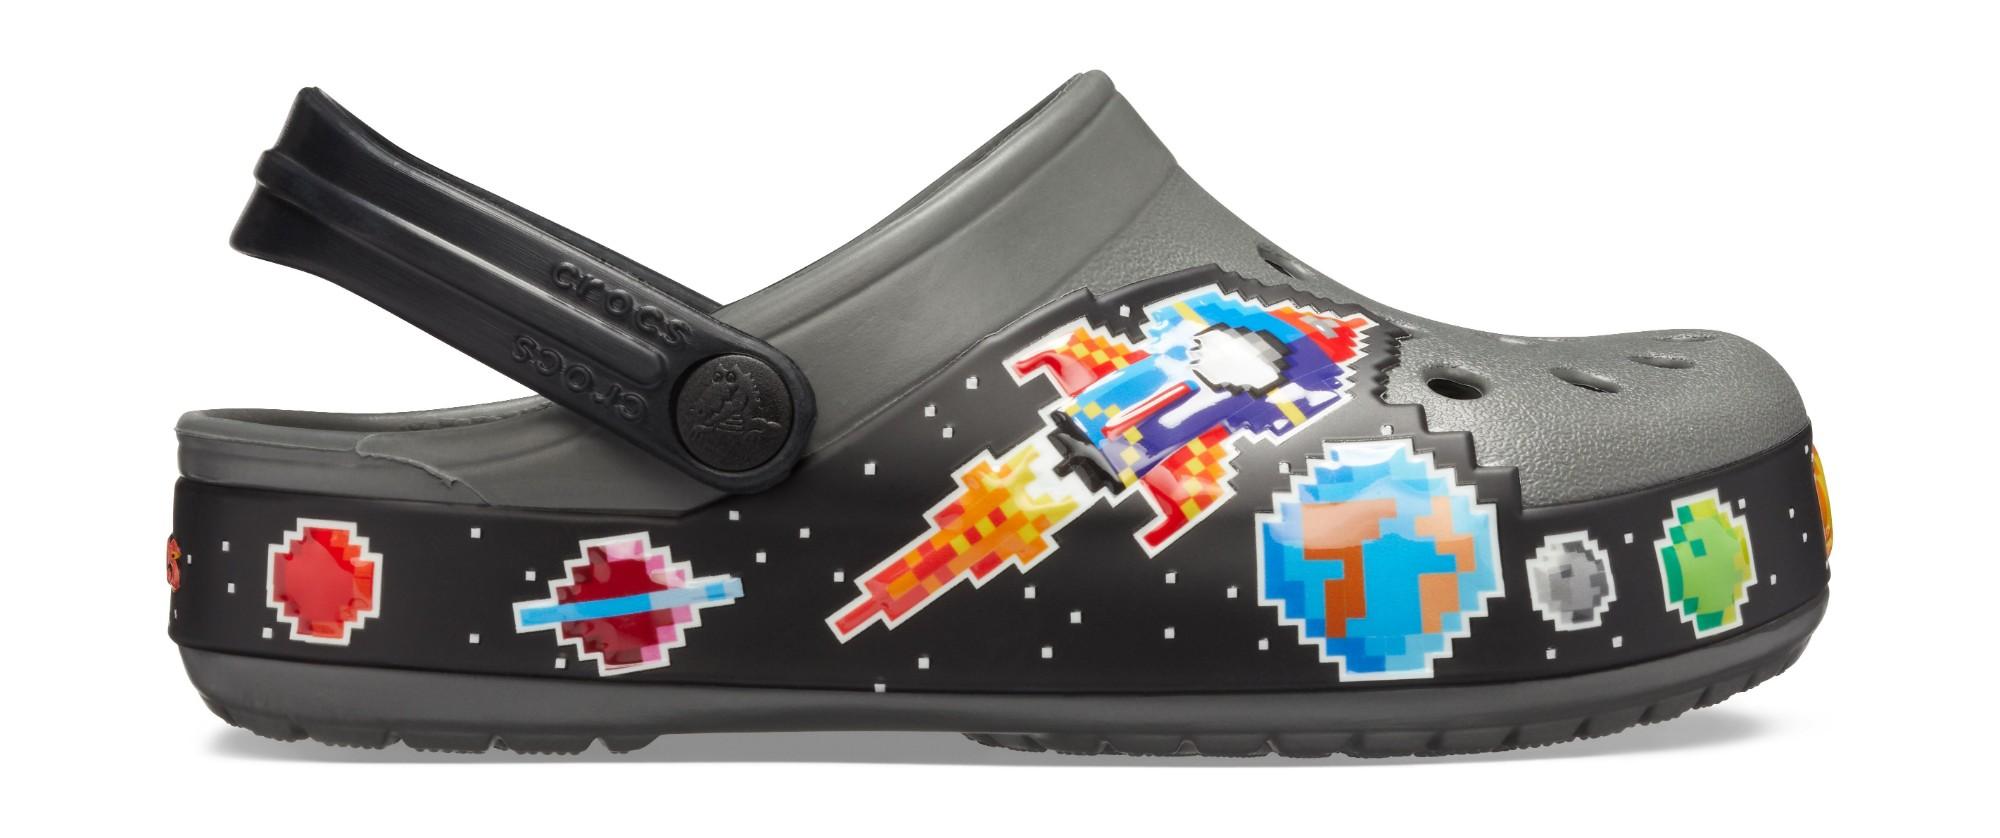 Crocs™ FunLab Galactic Clog Boy's Slate Grey 21